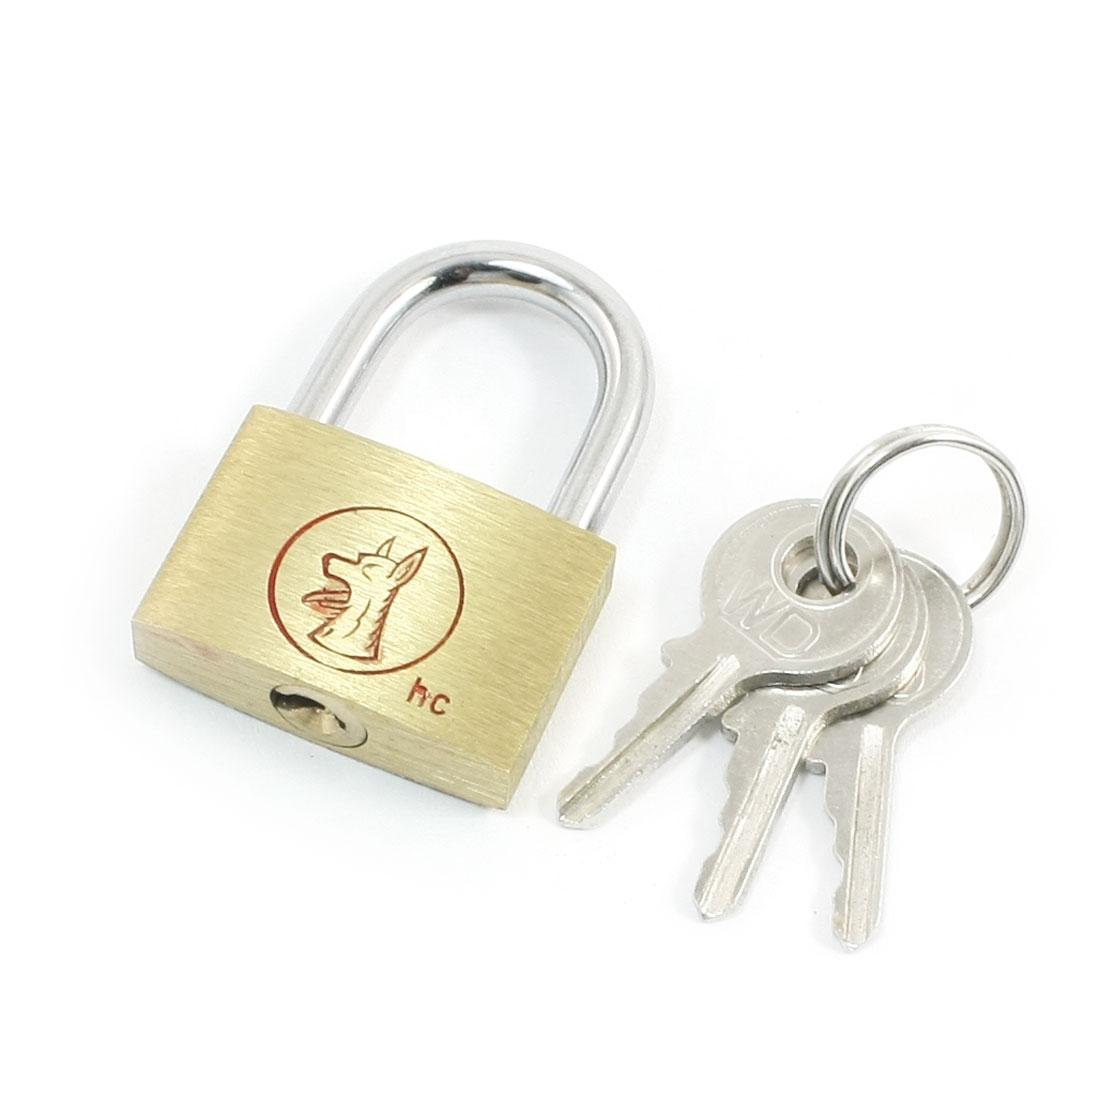 3 Keys + Door Luggage Security Lock Dual Tone Padlock